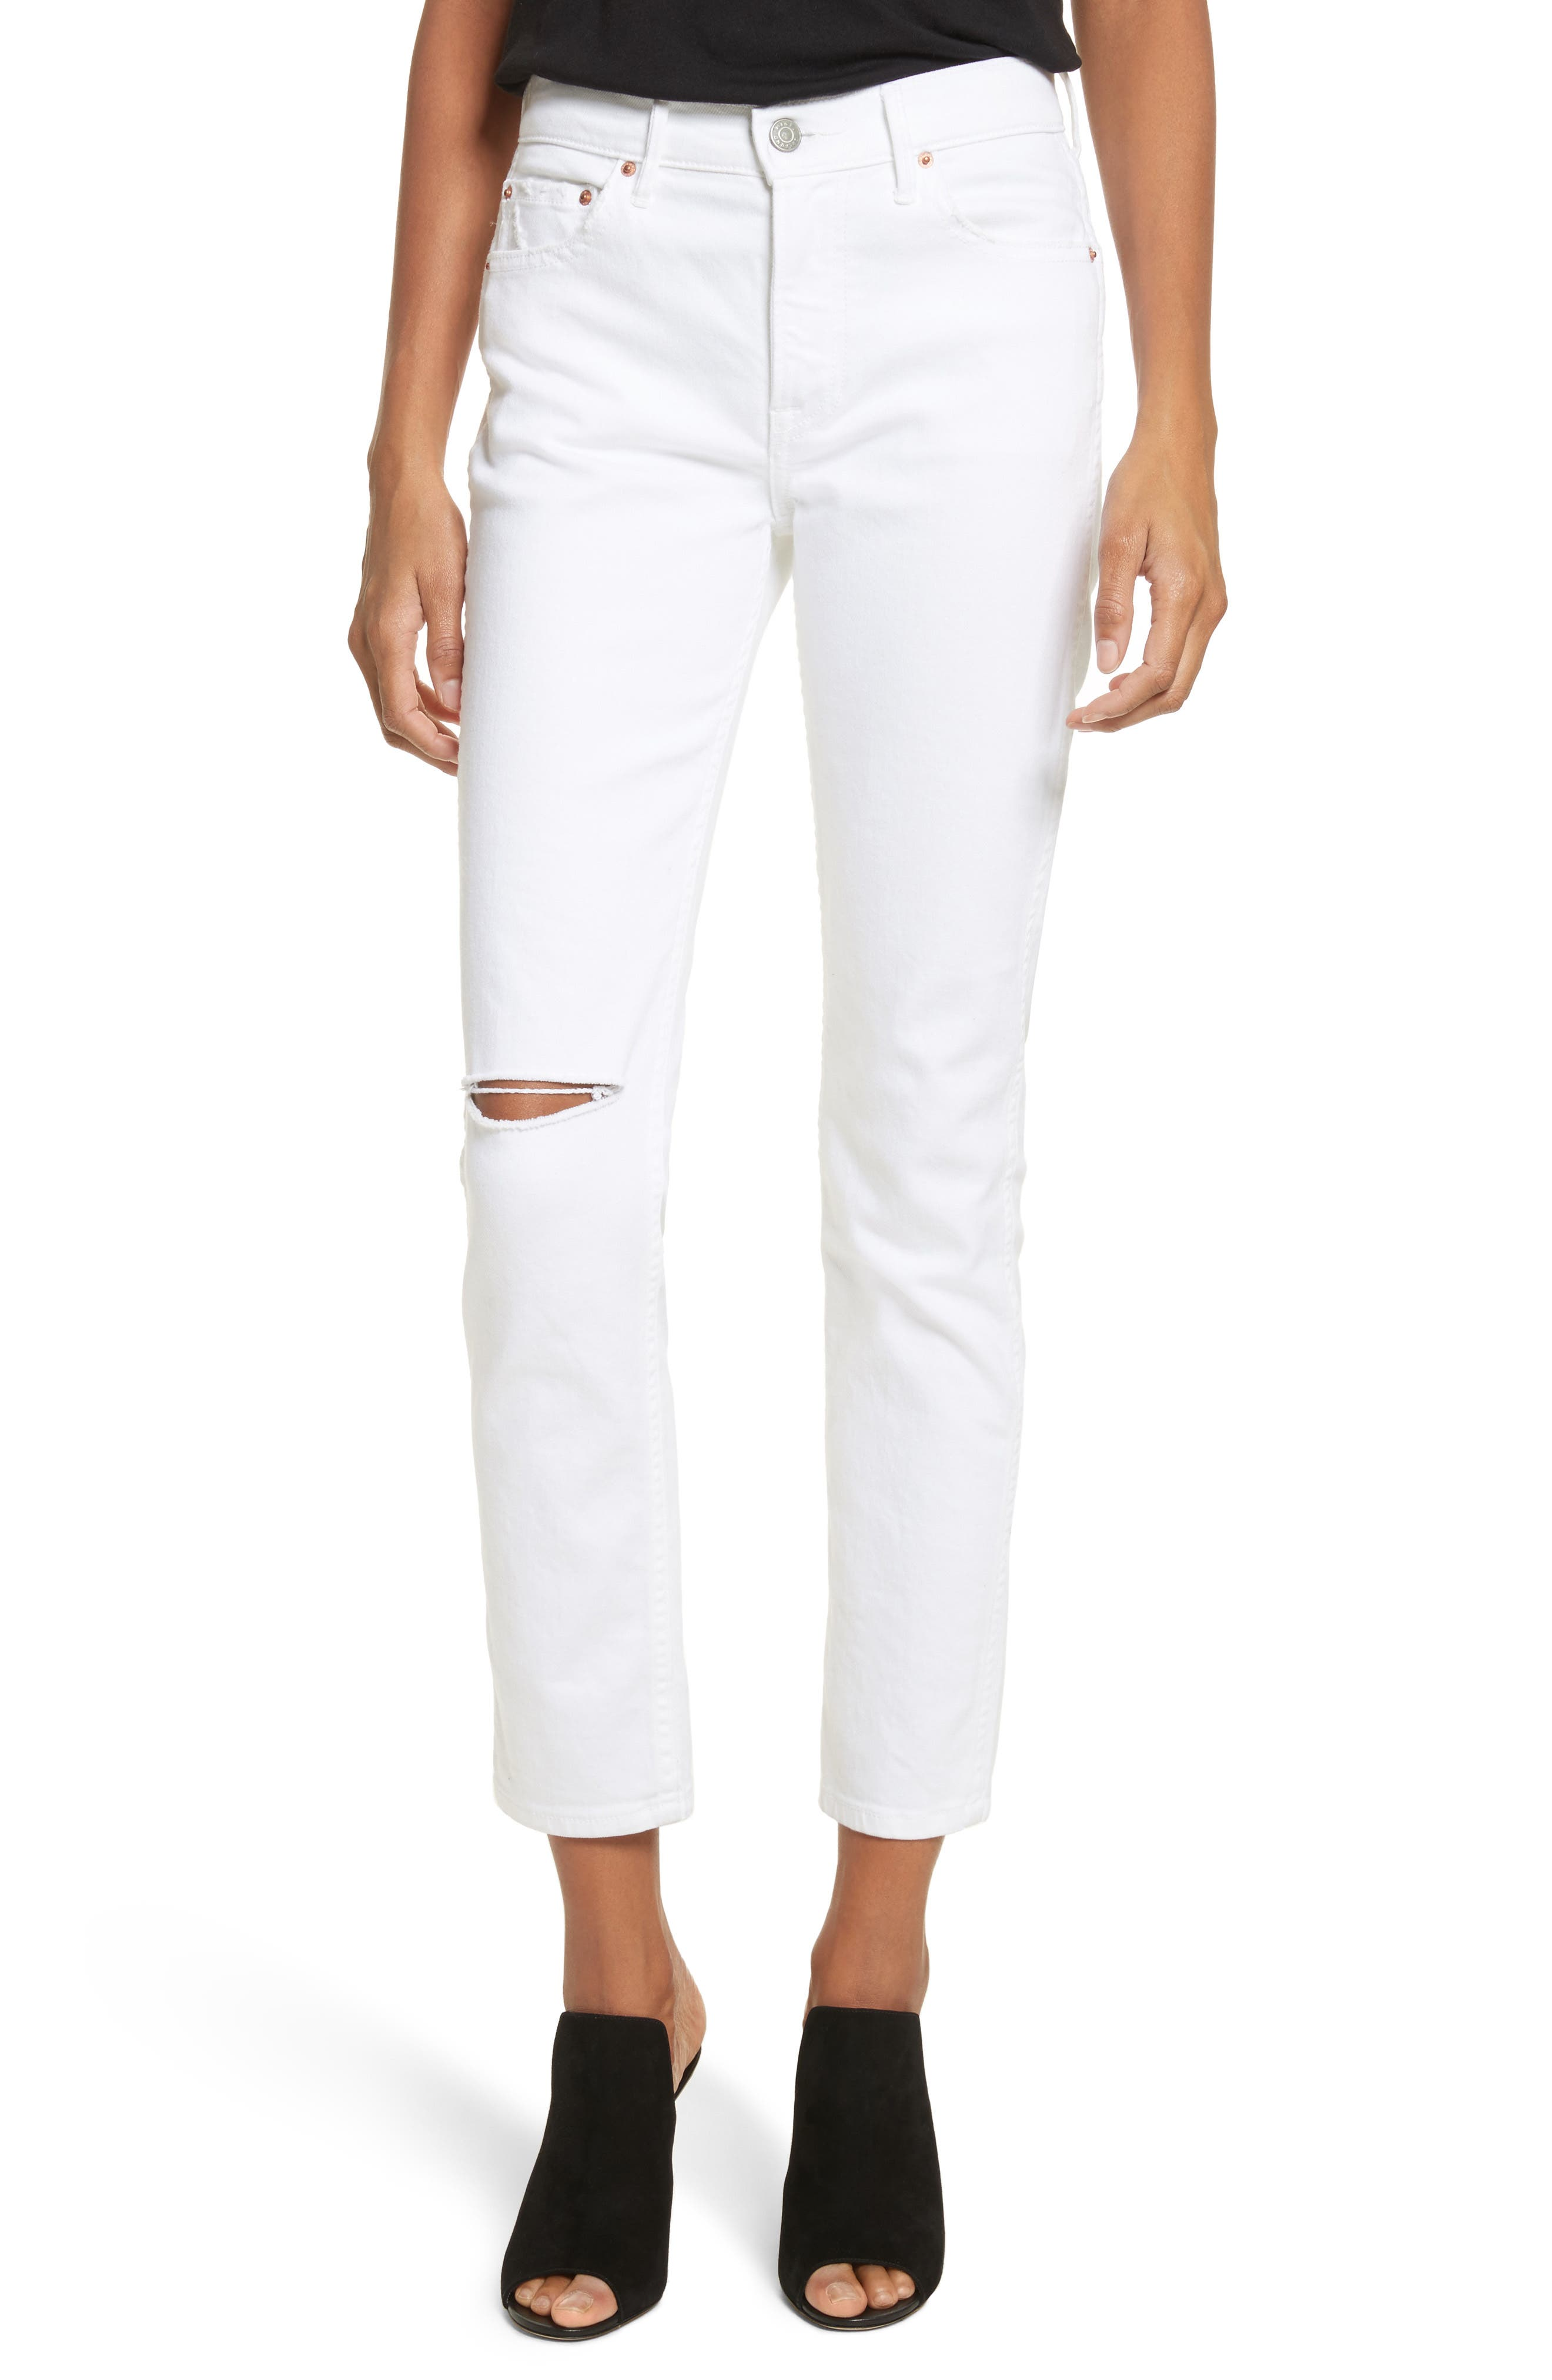 Main Image - GRLFRND Naomi High Waist Skinny Jeans (Florence)